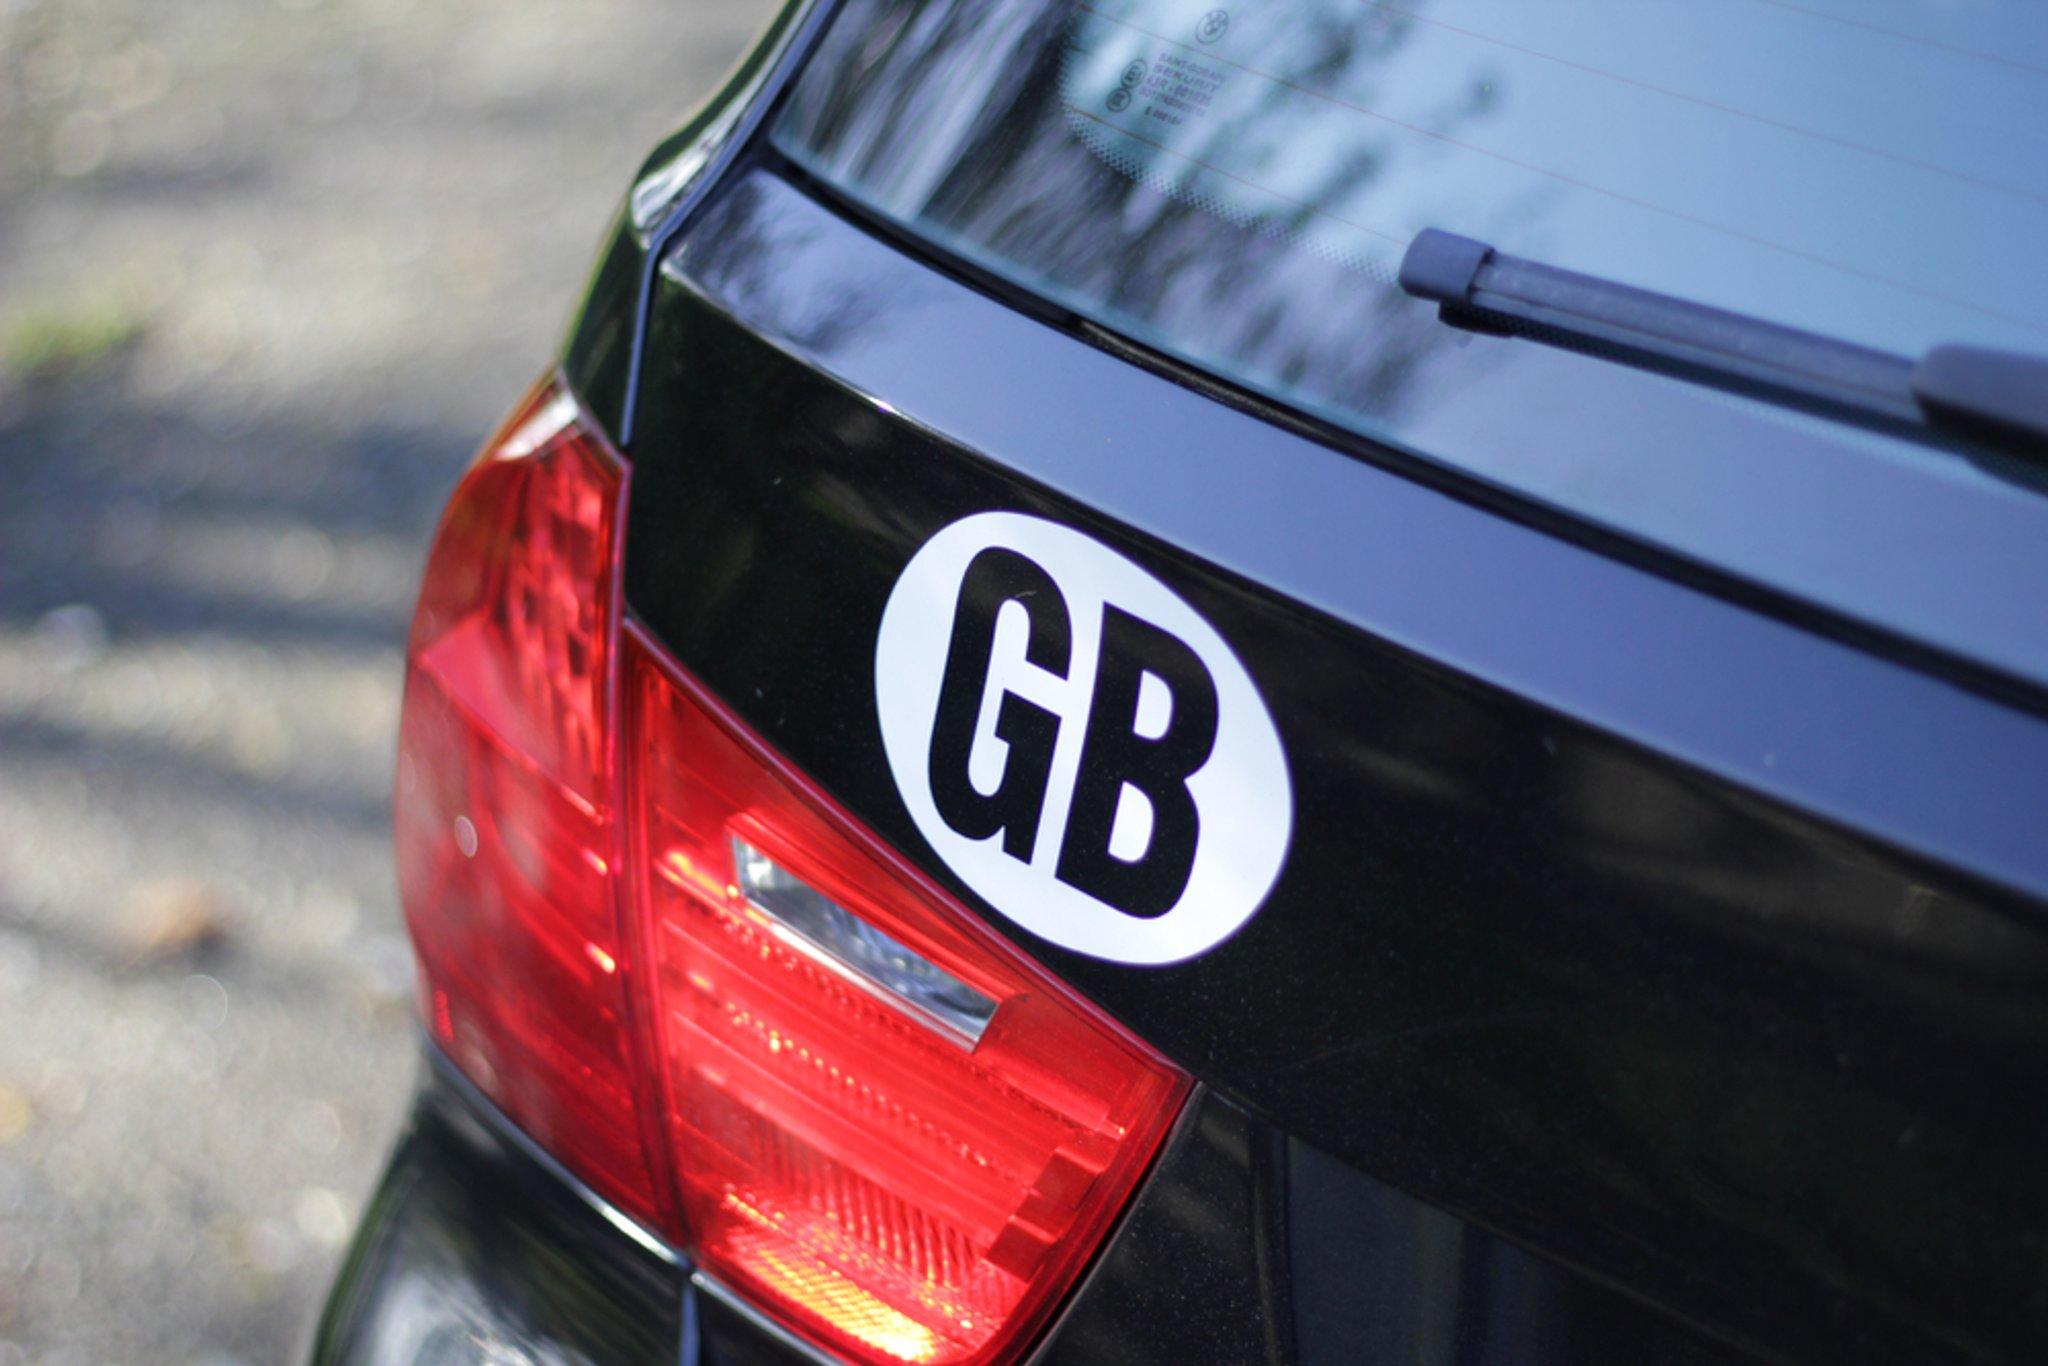 Stiker GB dibuang untuk penanda Inggris di bawah undang-undang plat nomor baru